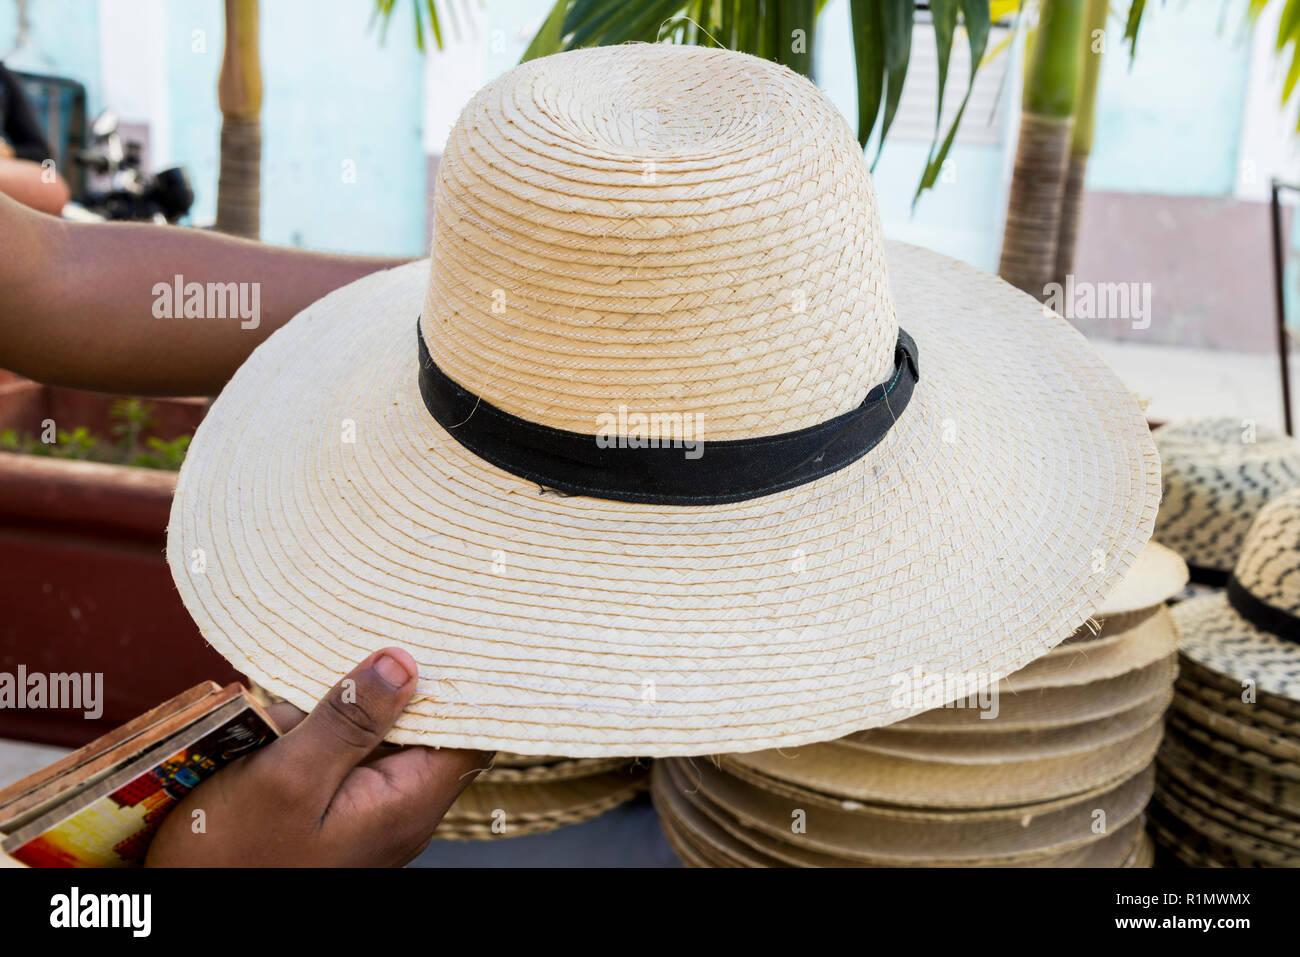 928184a9 Display of straw hats for sale in Cienfuegos Cuba - Street market -  Handcraft - Stock